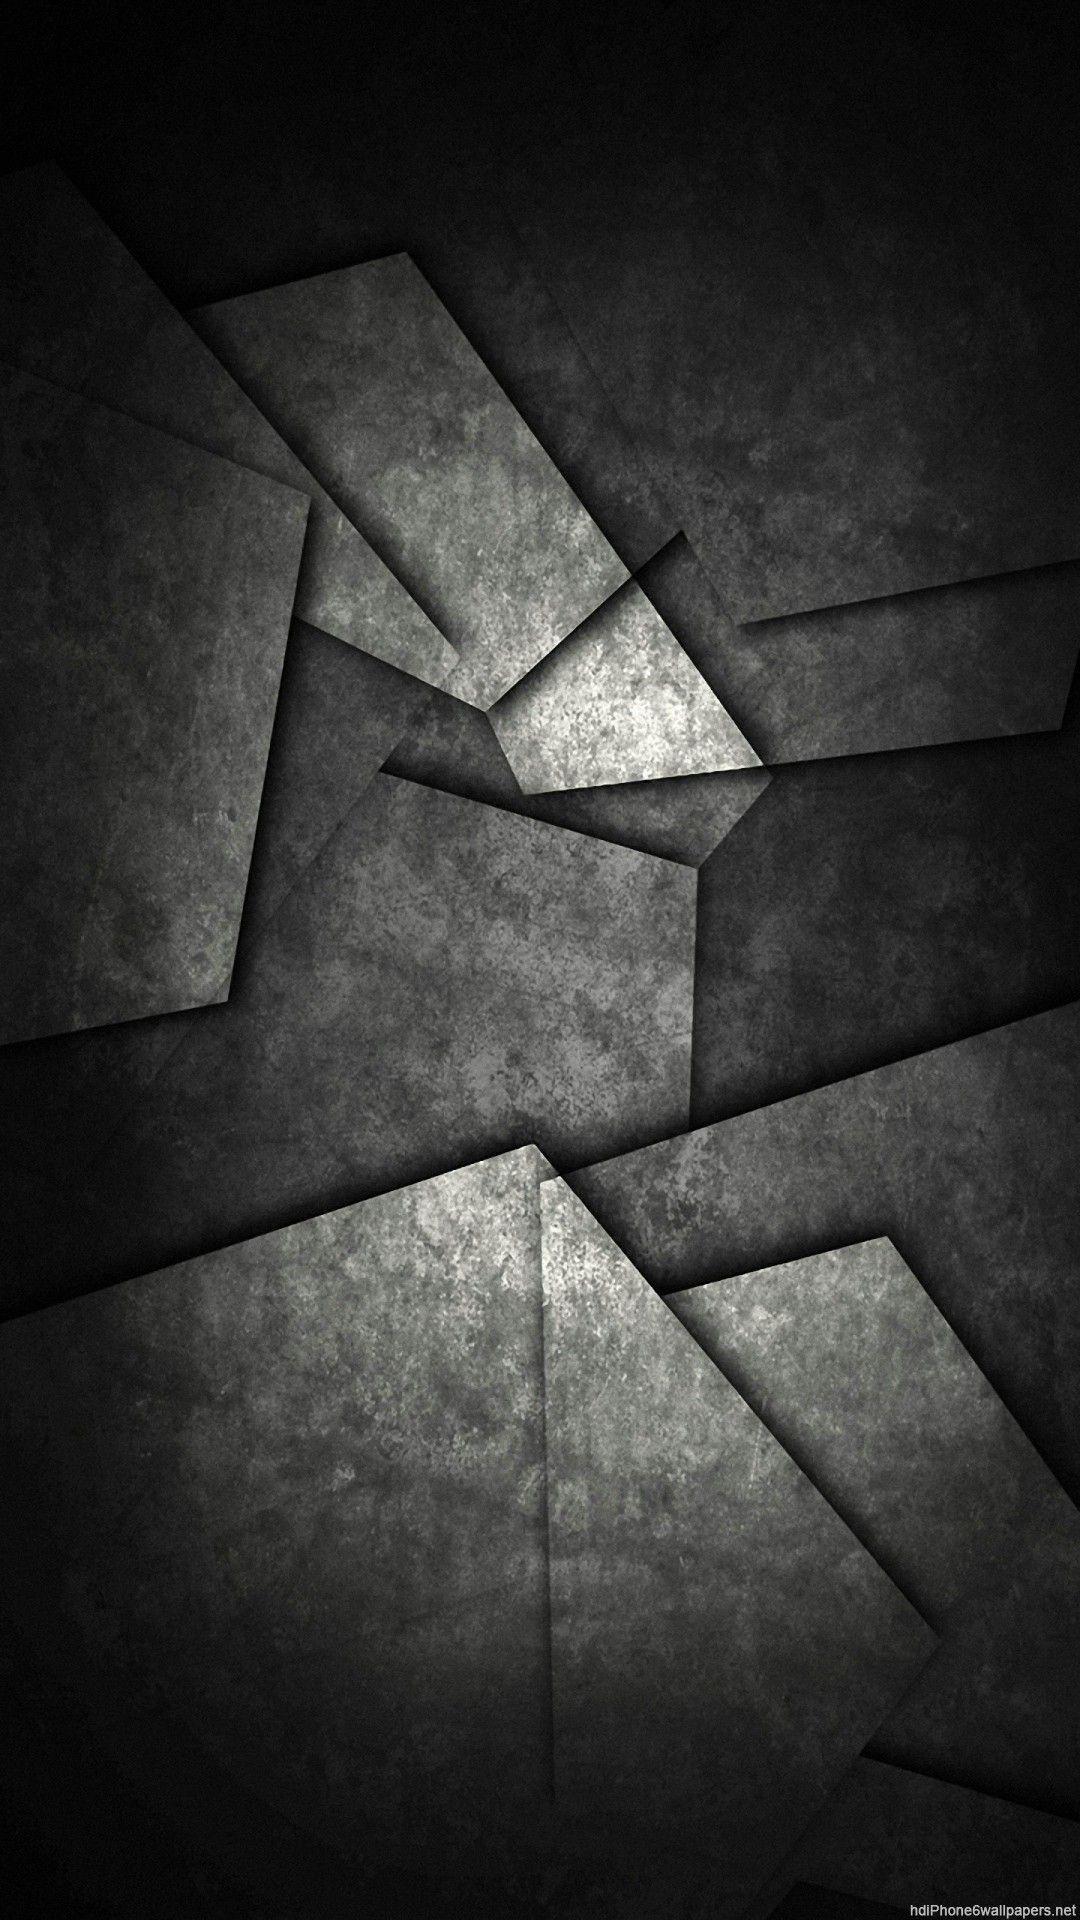 1080x1920 Hd Wallpapers Wallpaper Cave